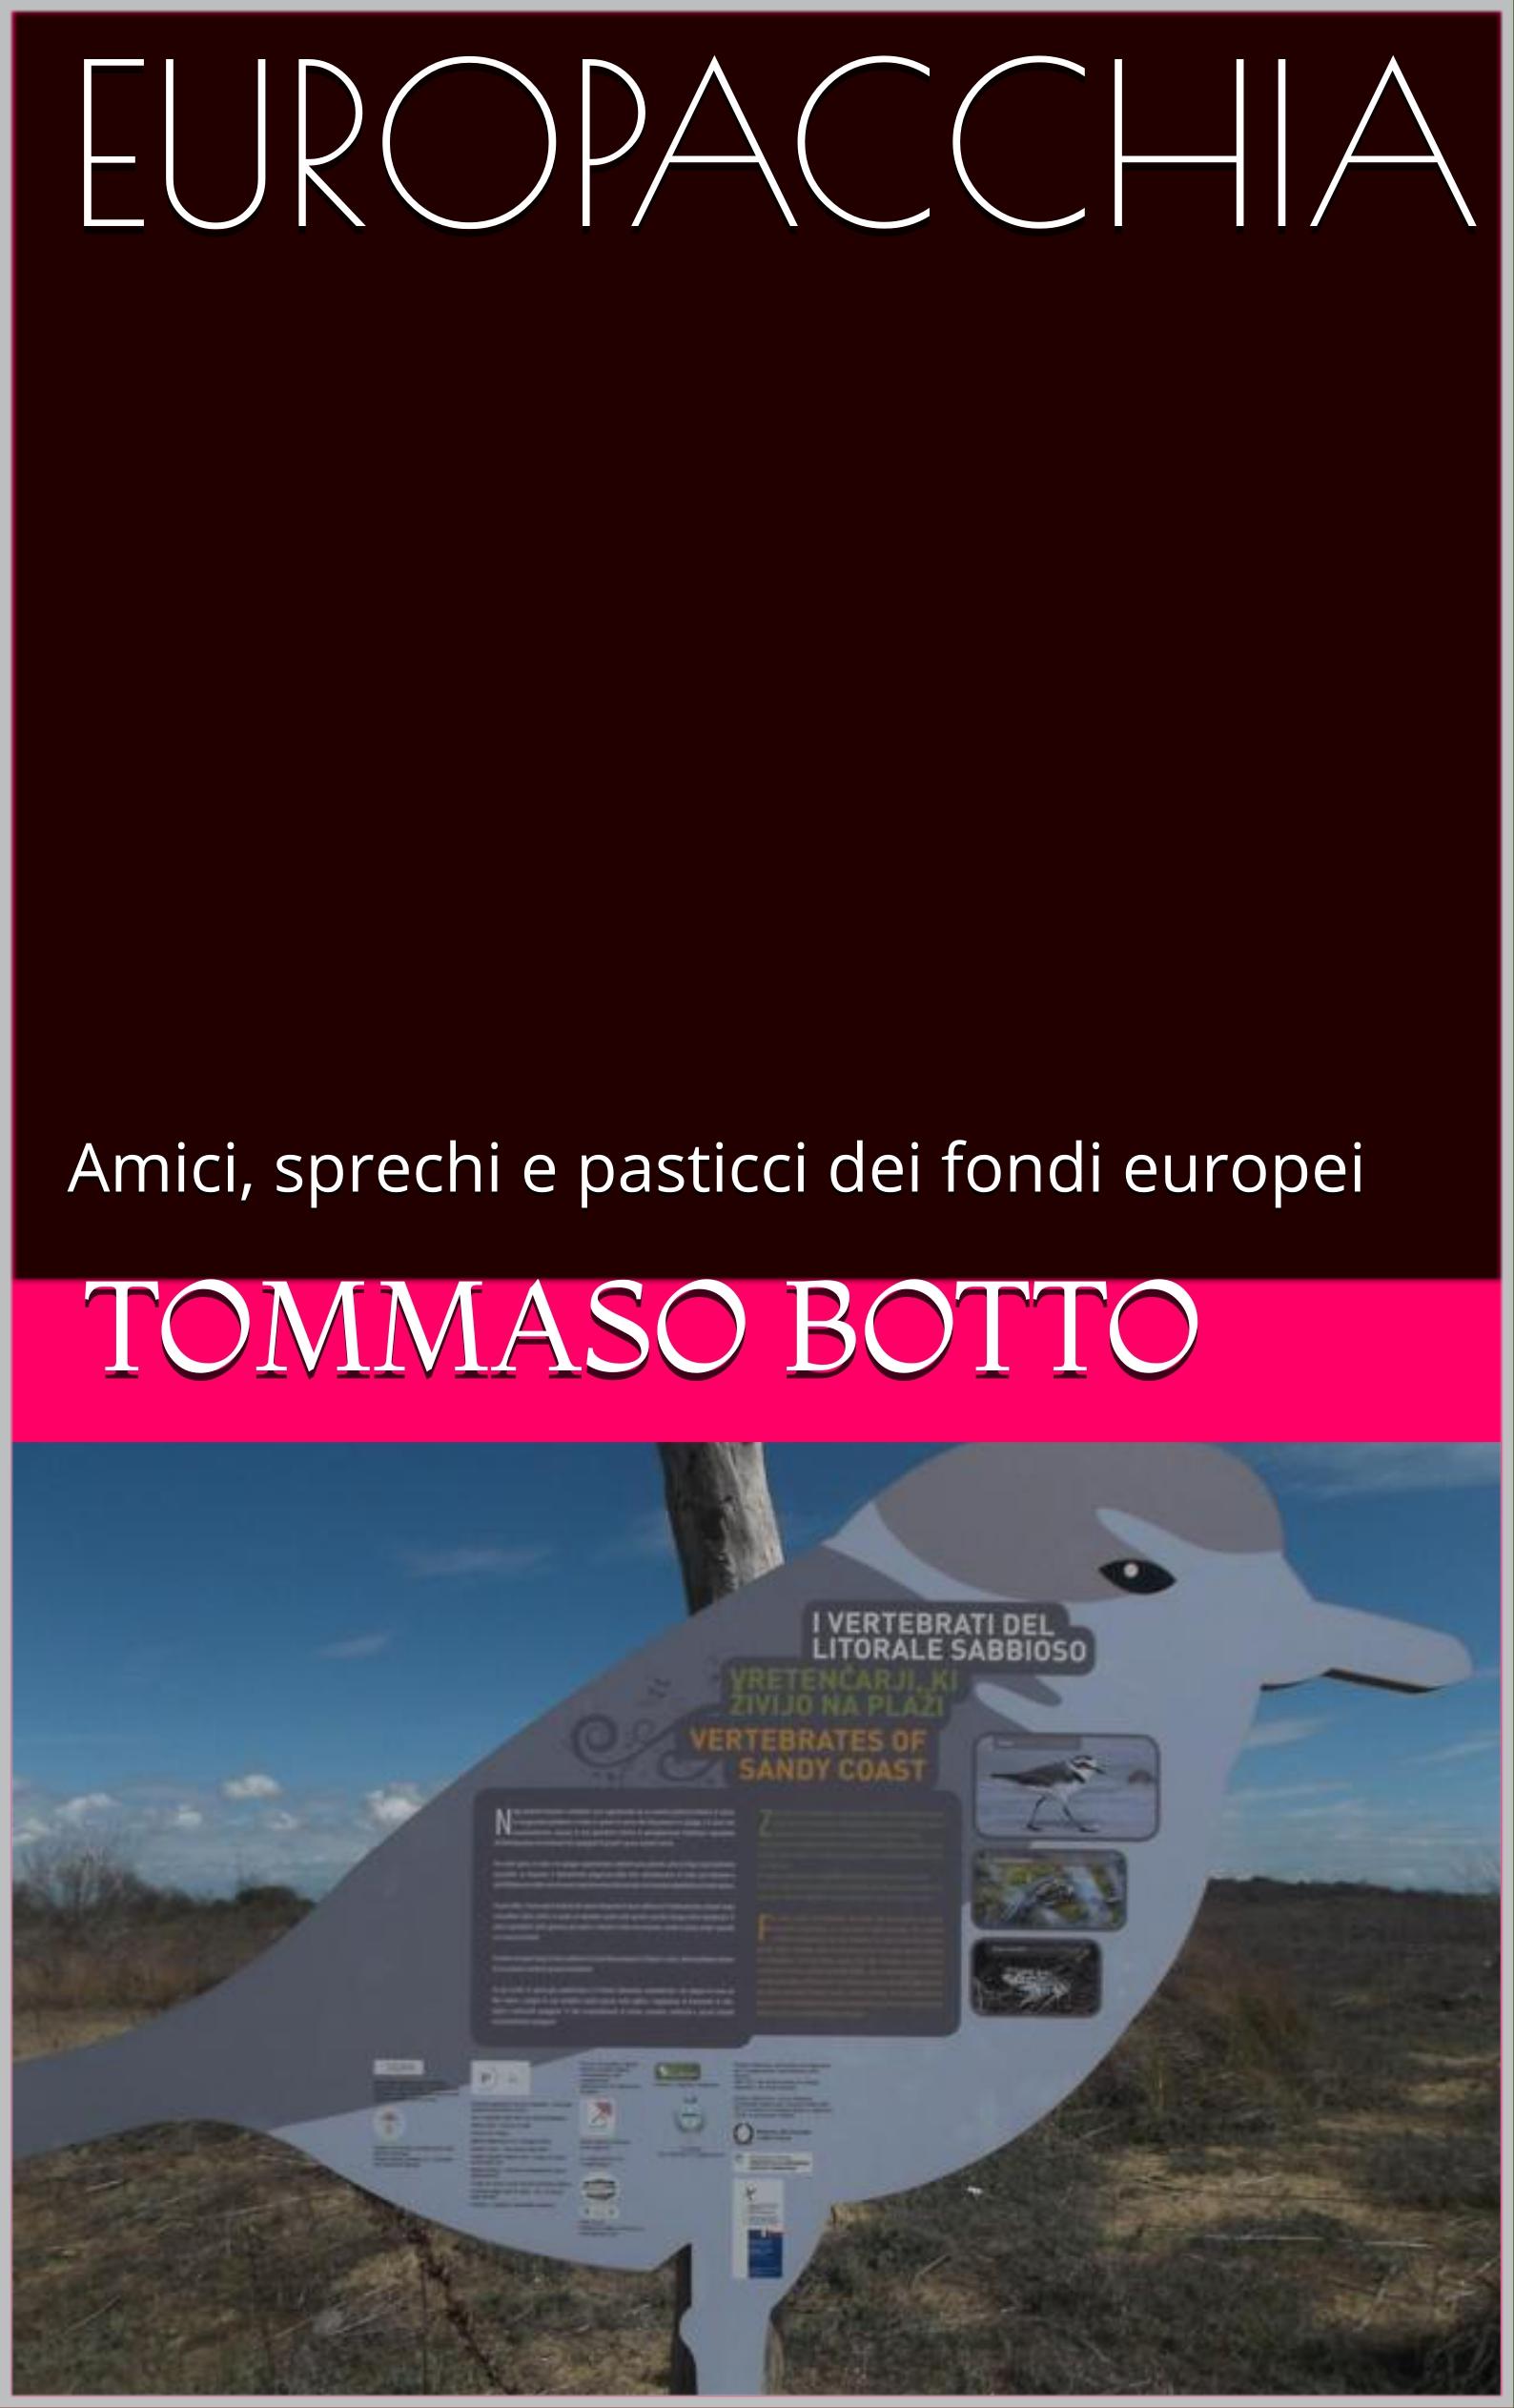 europacchia copertina